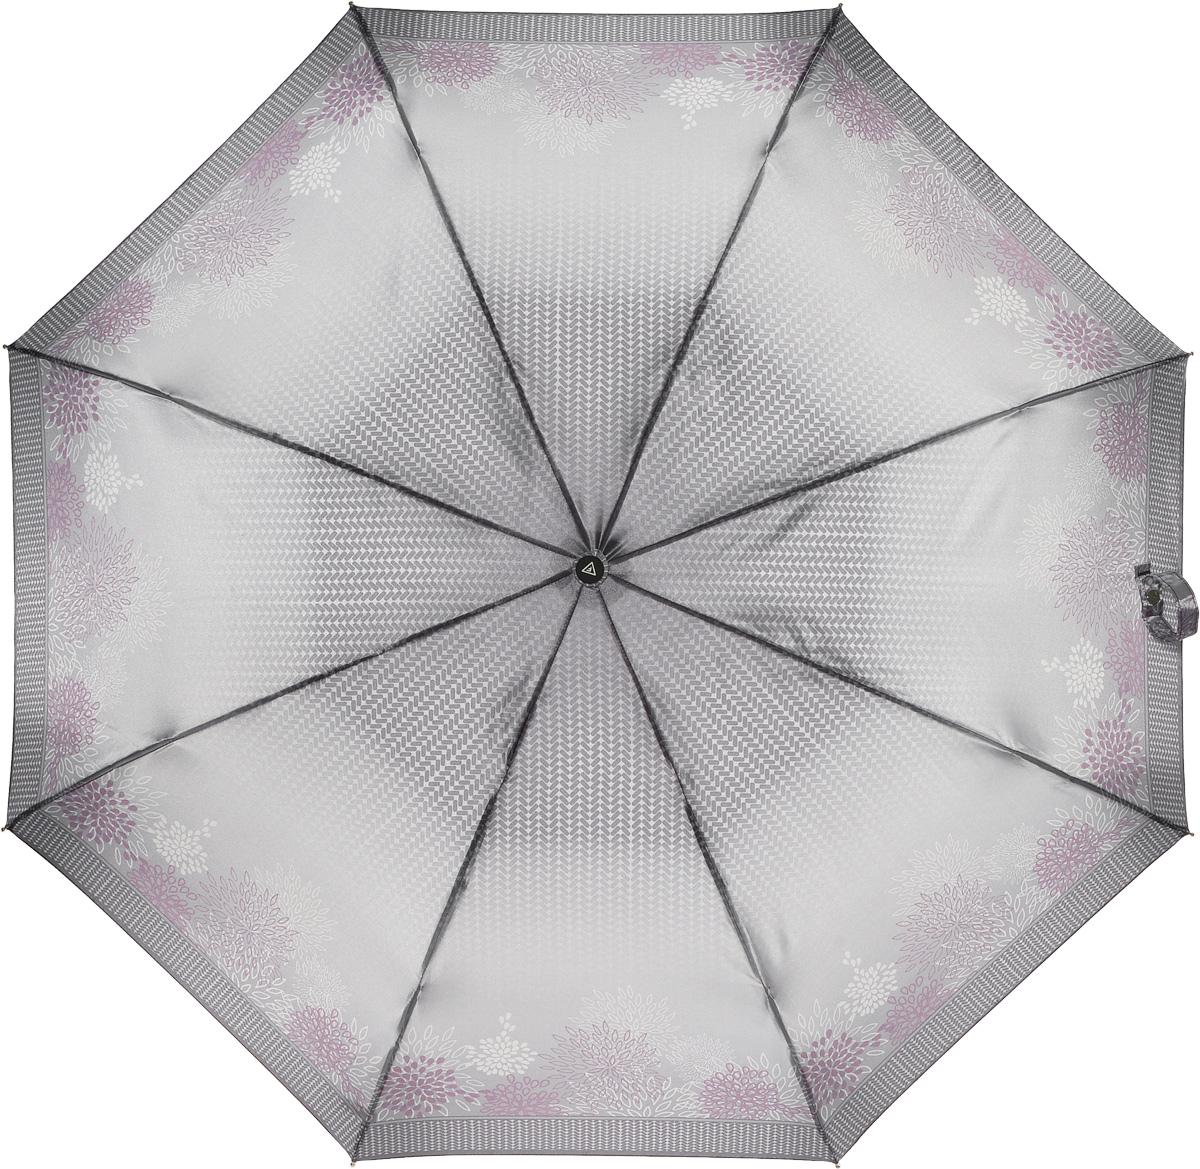 Зонт женский Fabretti, автомат, 3 сложения. L-16104-11L-16104-11Зонт женский Fabretti, облегченный суперавтомат, 3 сложения